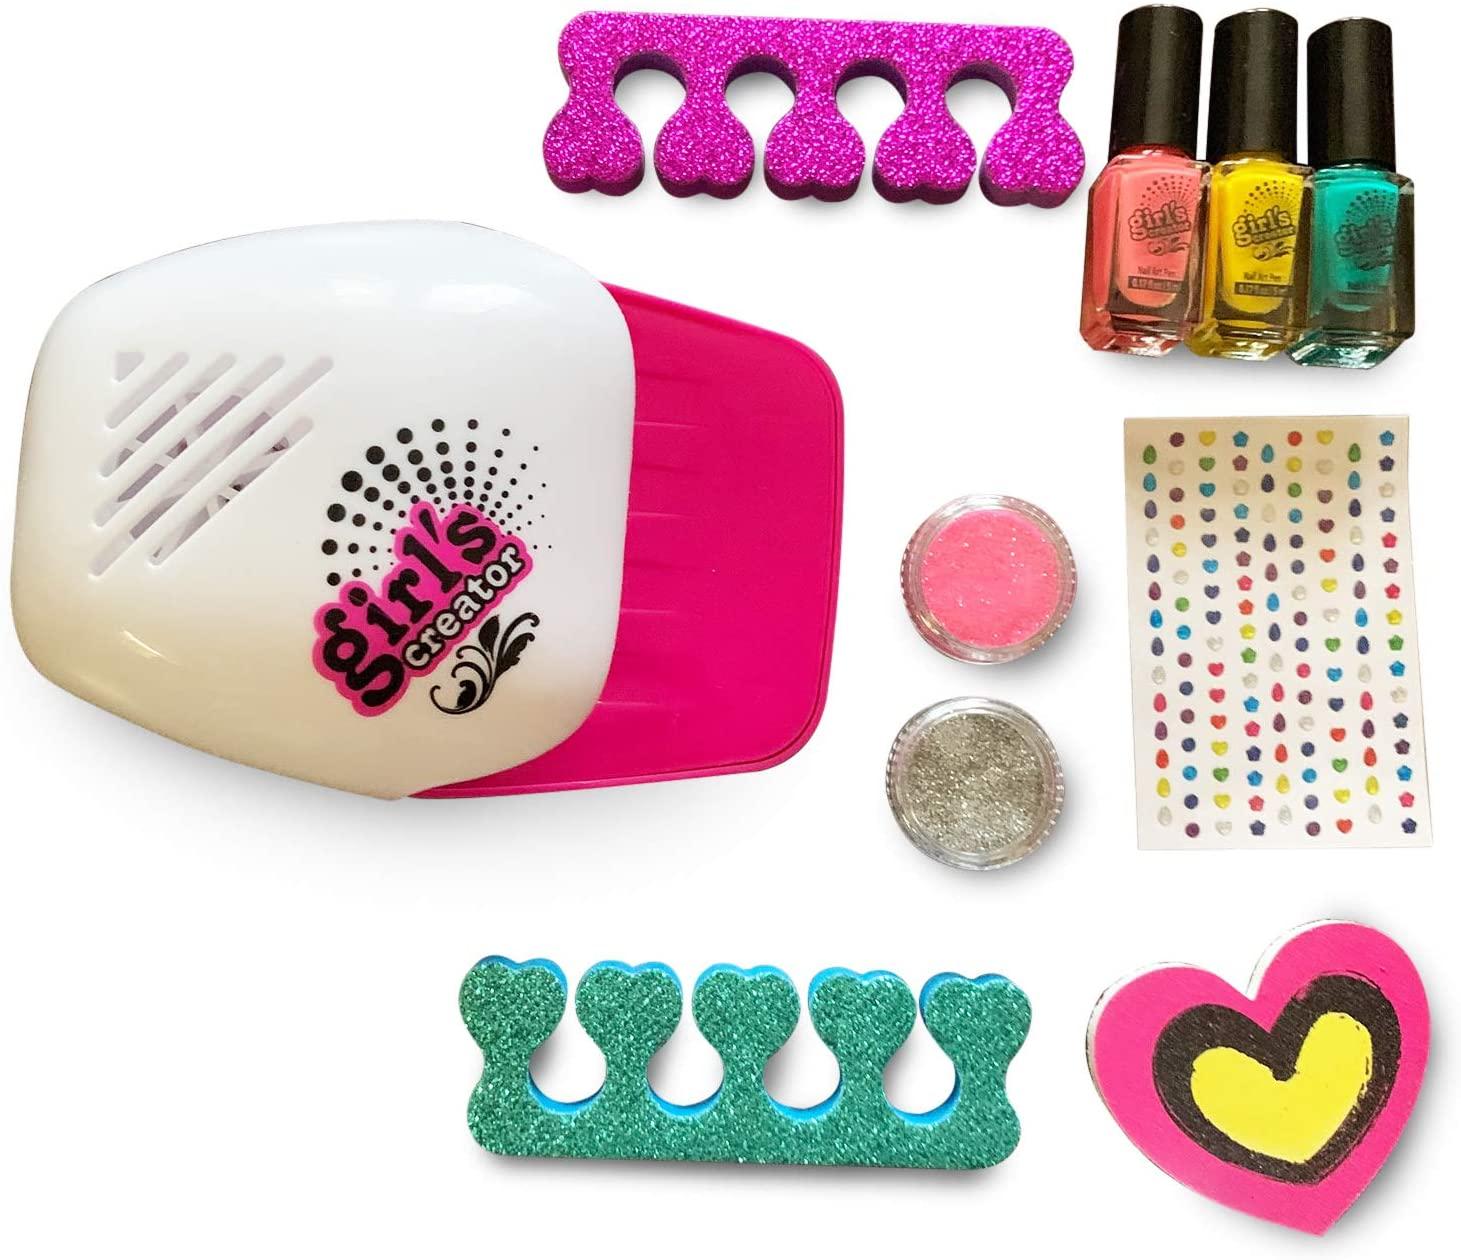 Fabulous Nail Glam Salon - Nail Polish Kit for Girls and Up with Vibrant Nail Polish and Nail Dryer - Emoji Pedicure and Manicure Kit